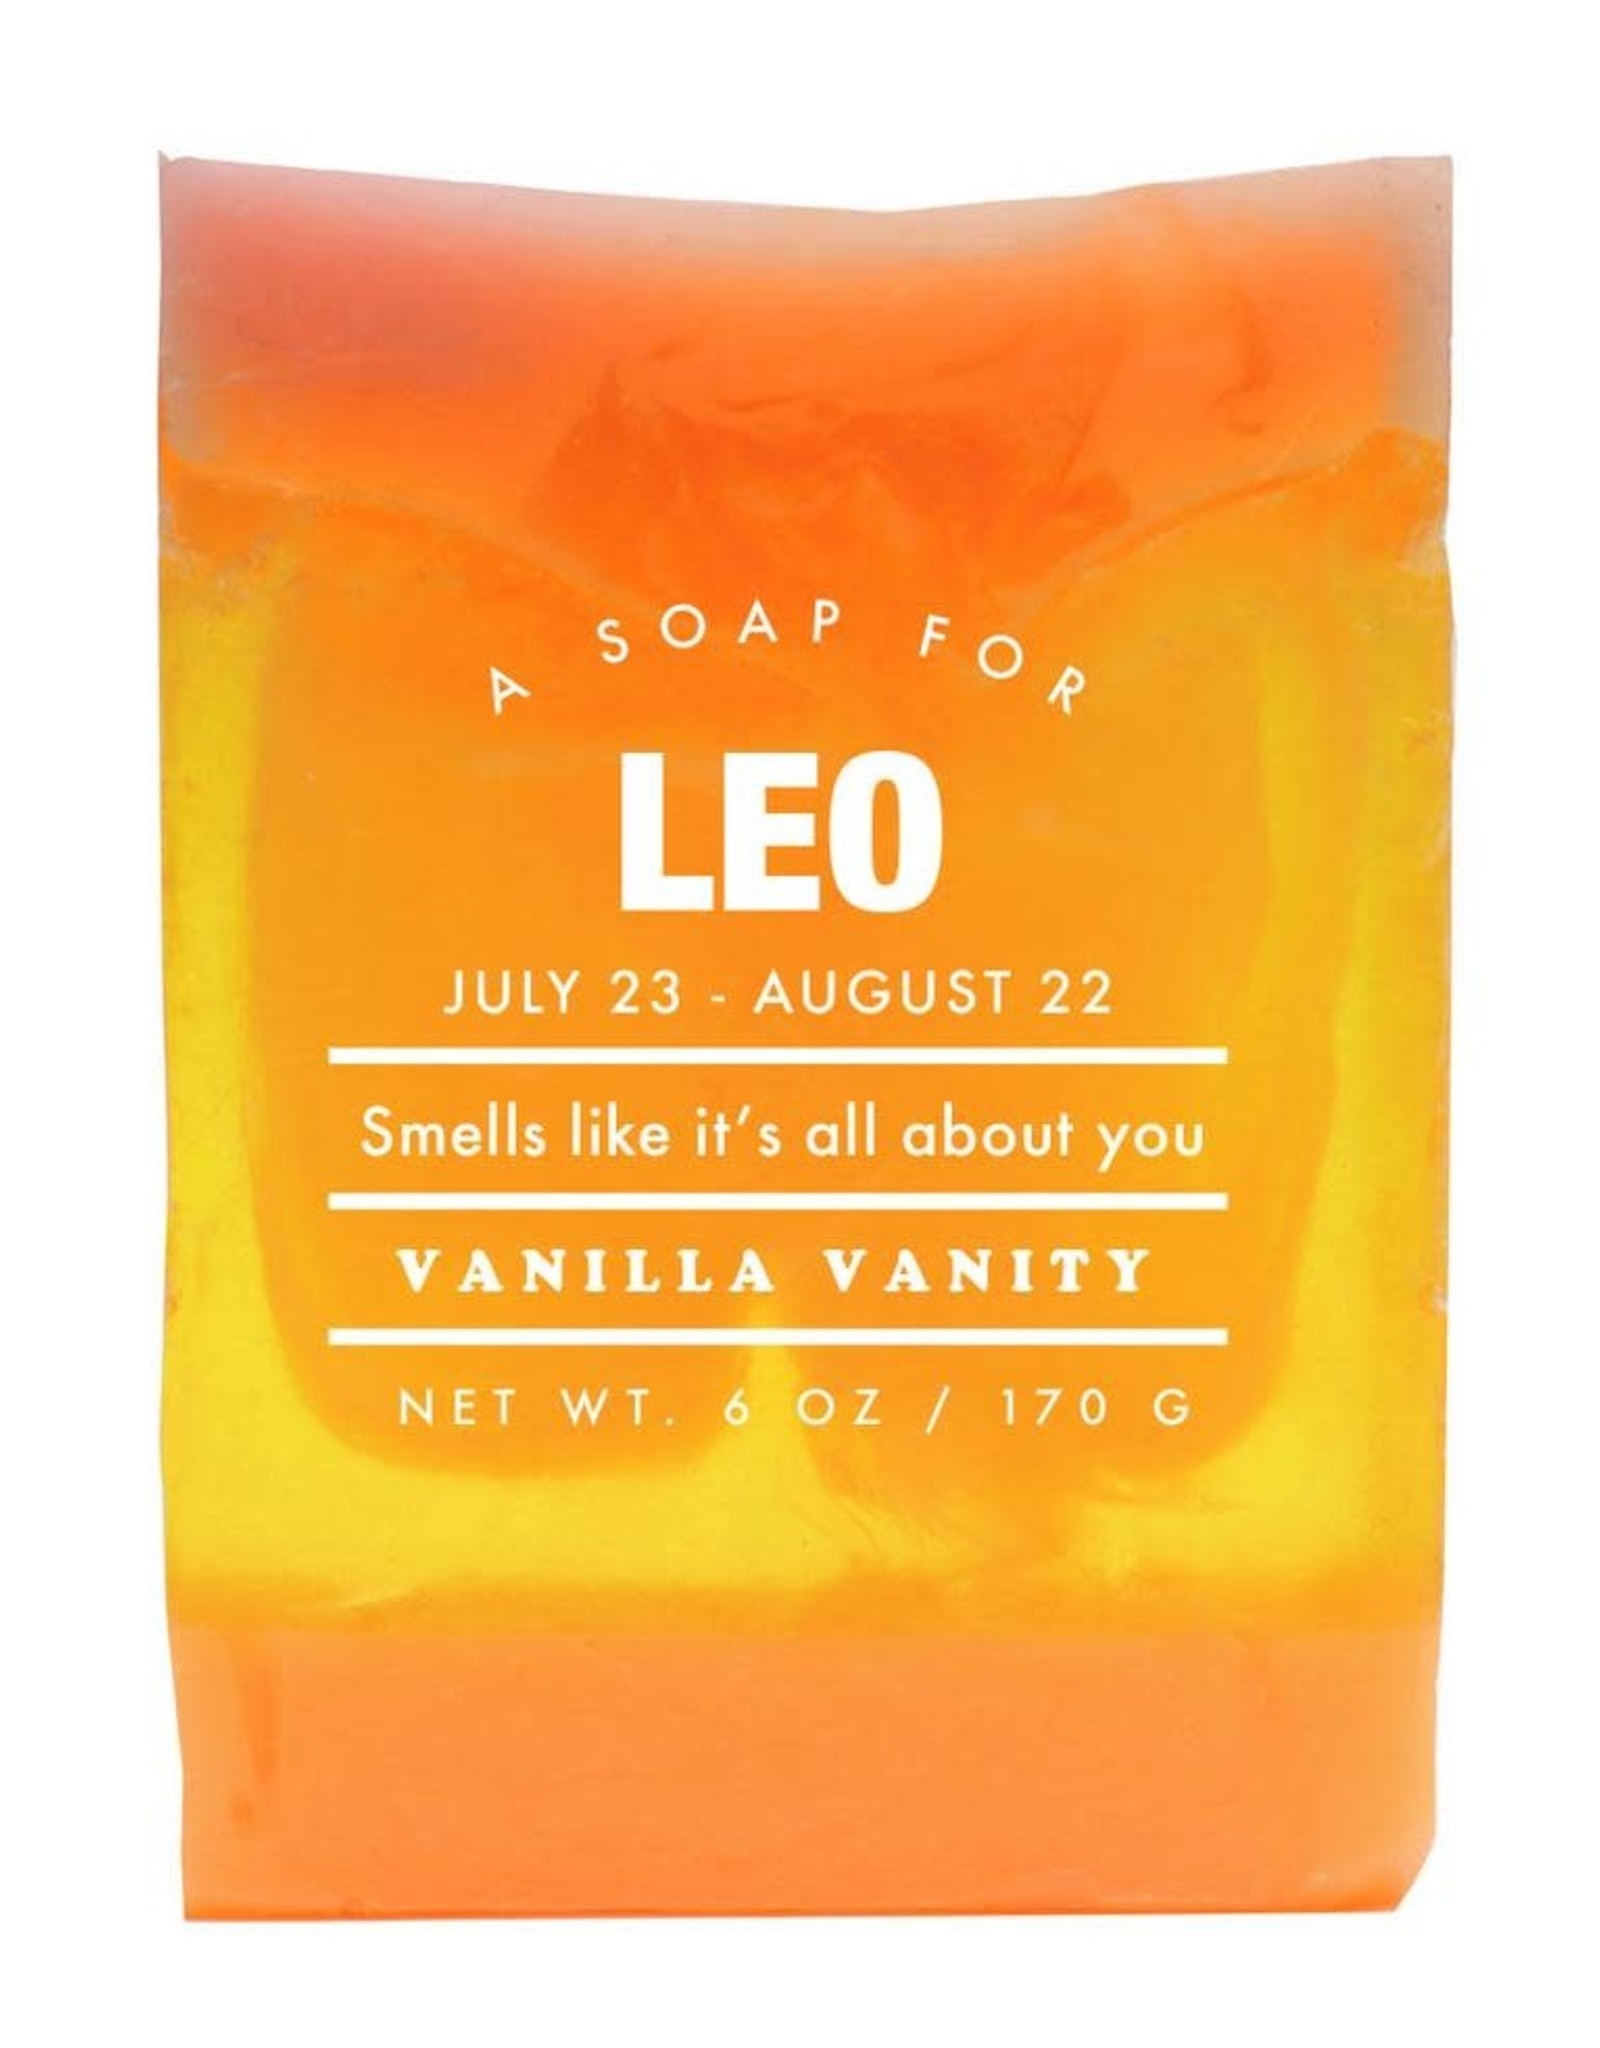 Whiskey River Soap WER - Soap/ Leo 6 oz